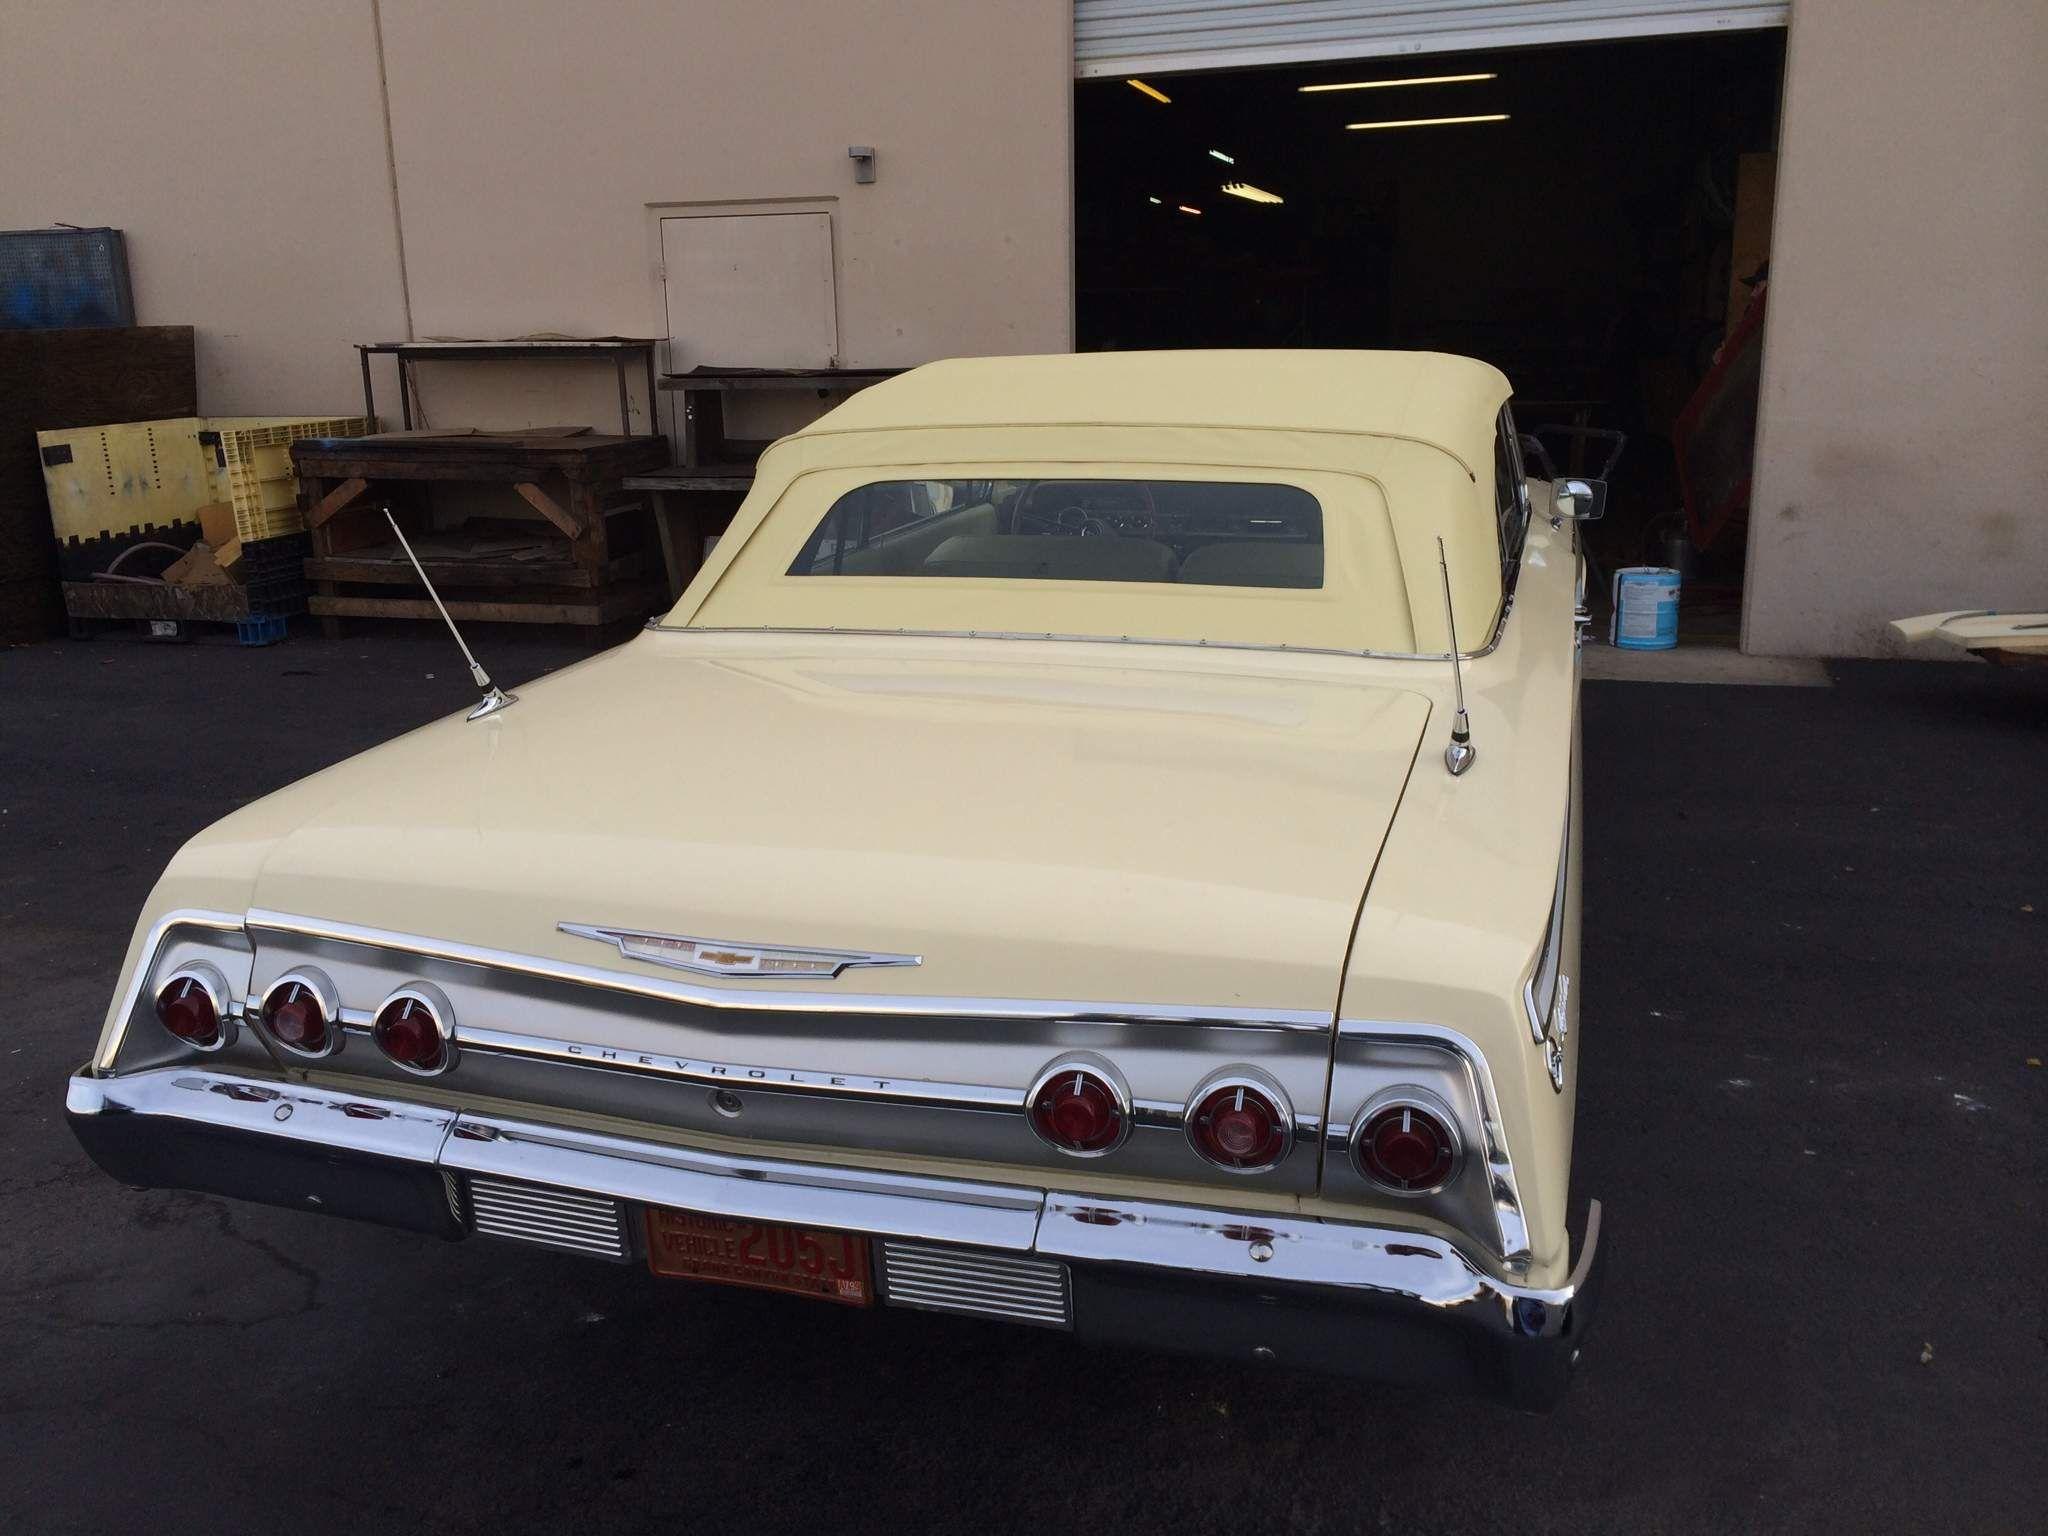 1962 Chevrolet Impala Gm Yellow Vinyl With Custom Non Original Glass Installed By Ciadella Interiors